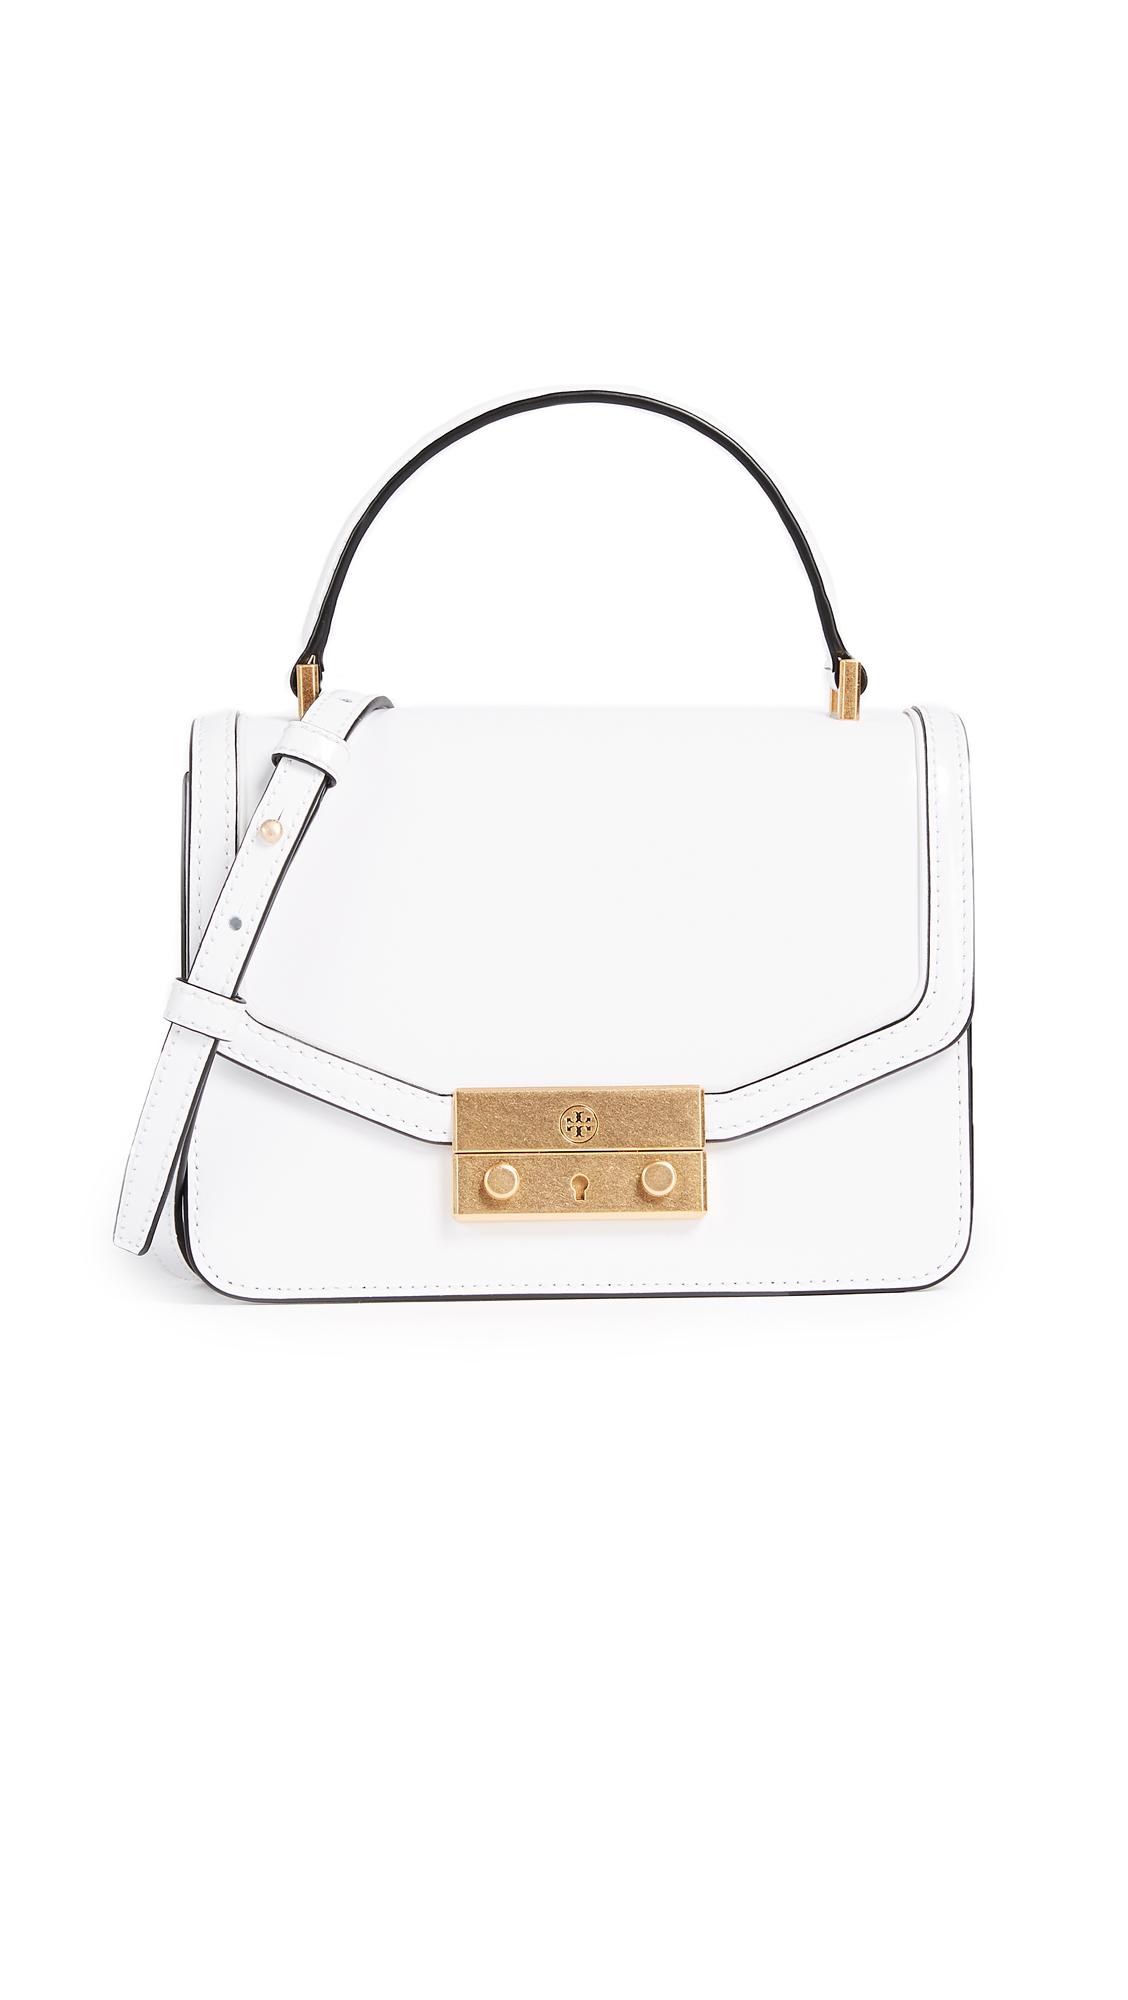 Tory Burch Juliette Mini Top Handle Cross Body Bag - White